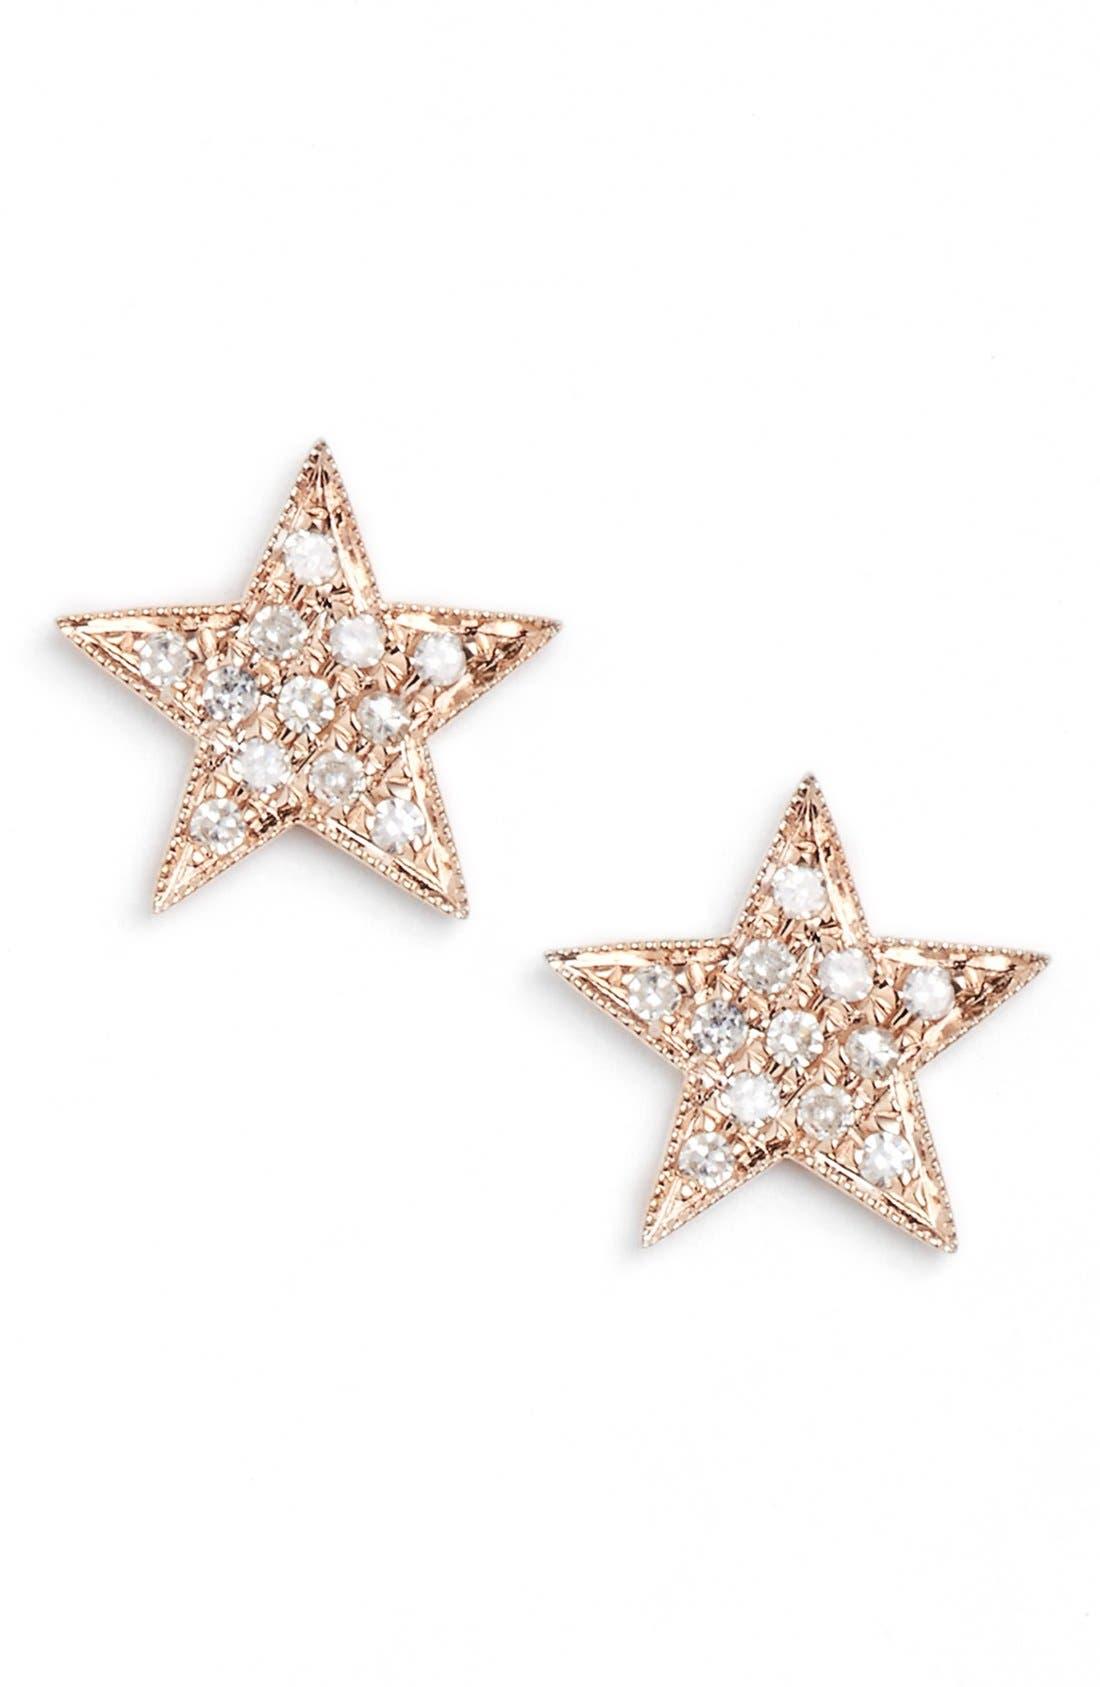 'Julianne Himiko' Diamond Star Stud Earrings,                             Main thumbnail 1, color,                             Rose Gold